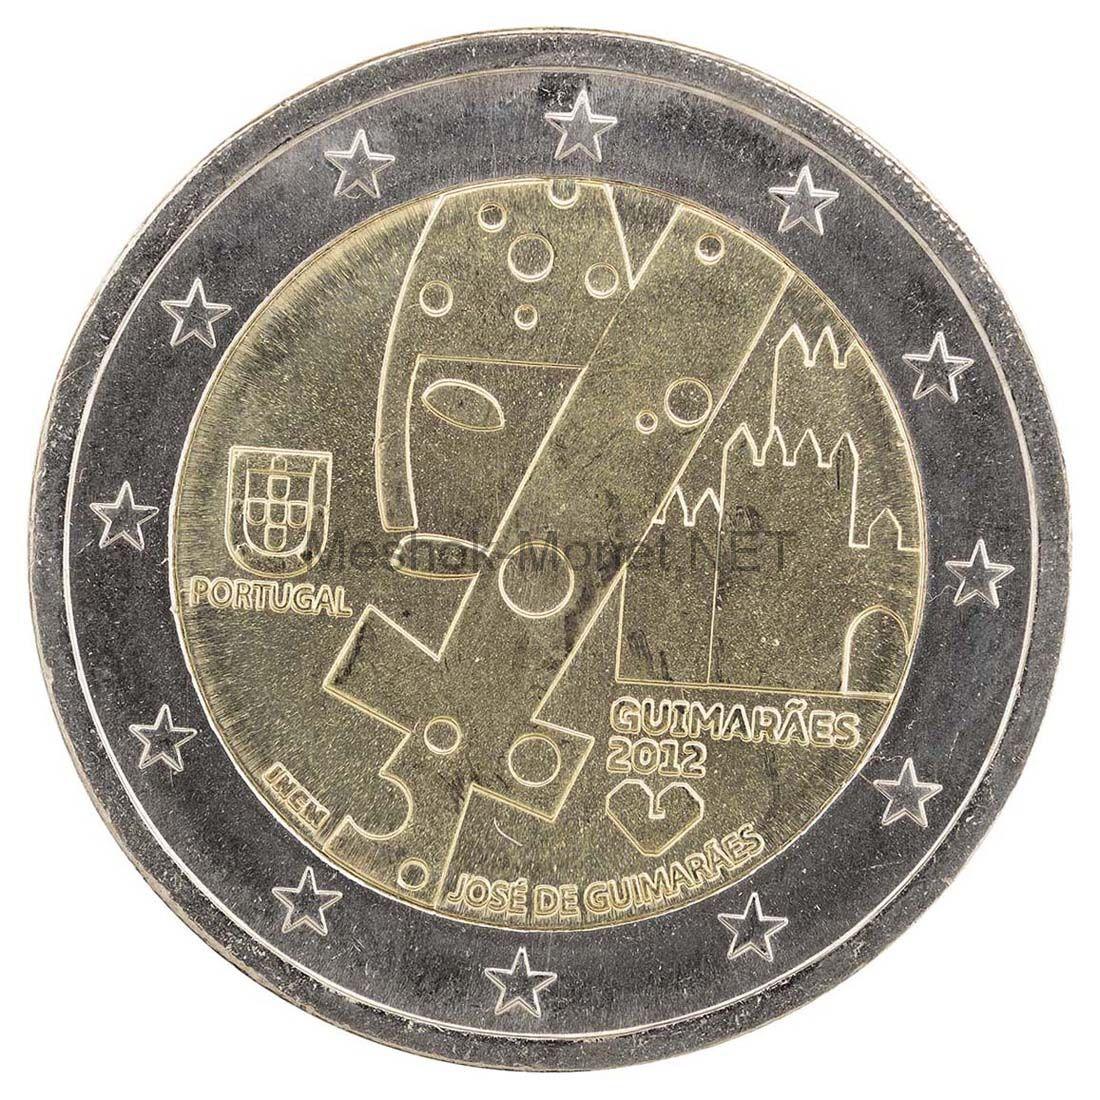 Португалия 2 евро 2012, Гимарайнш-Культурная столица Европы